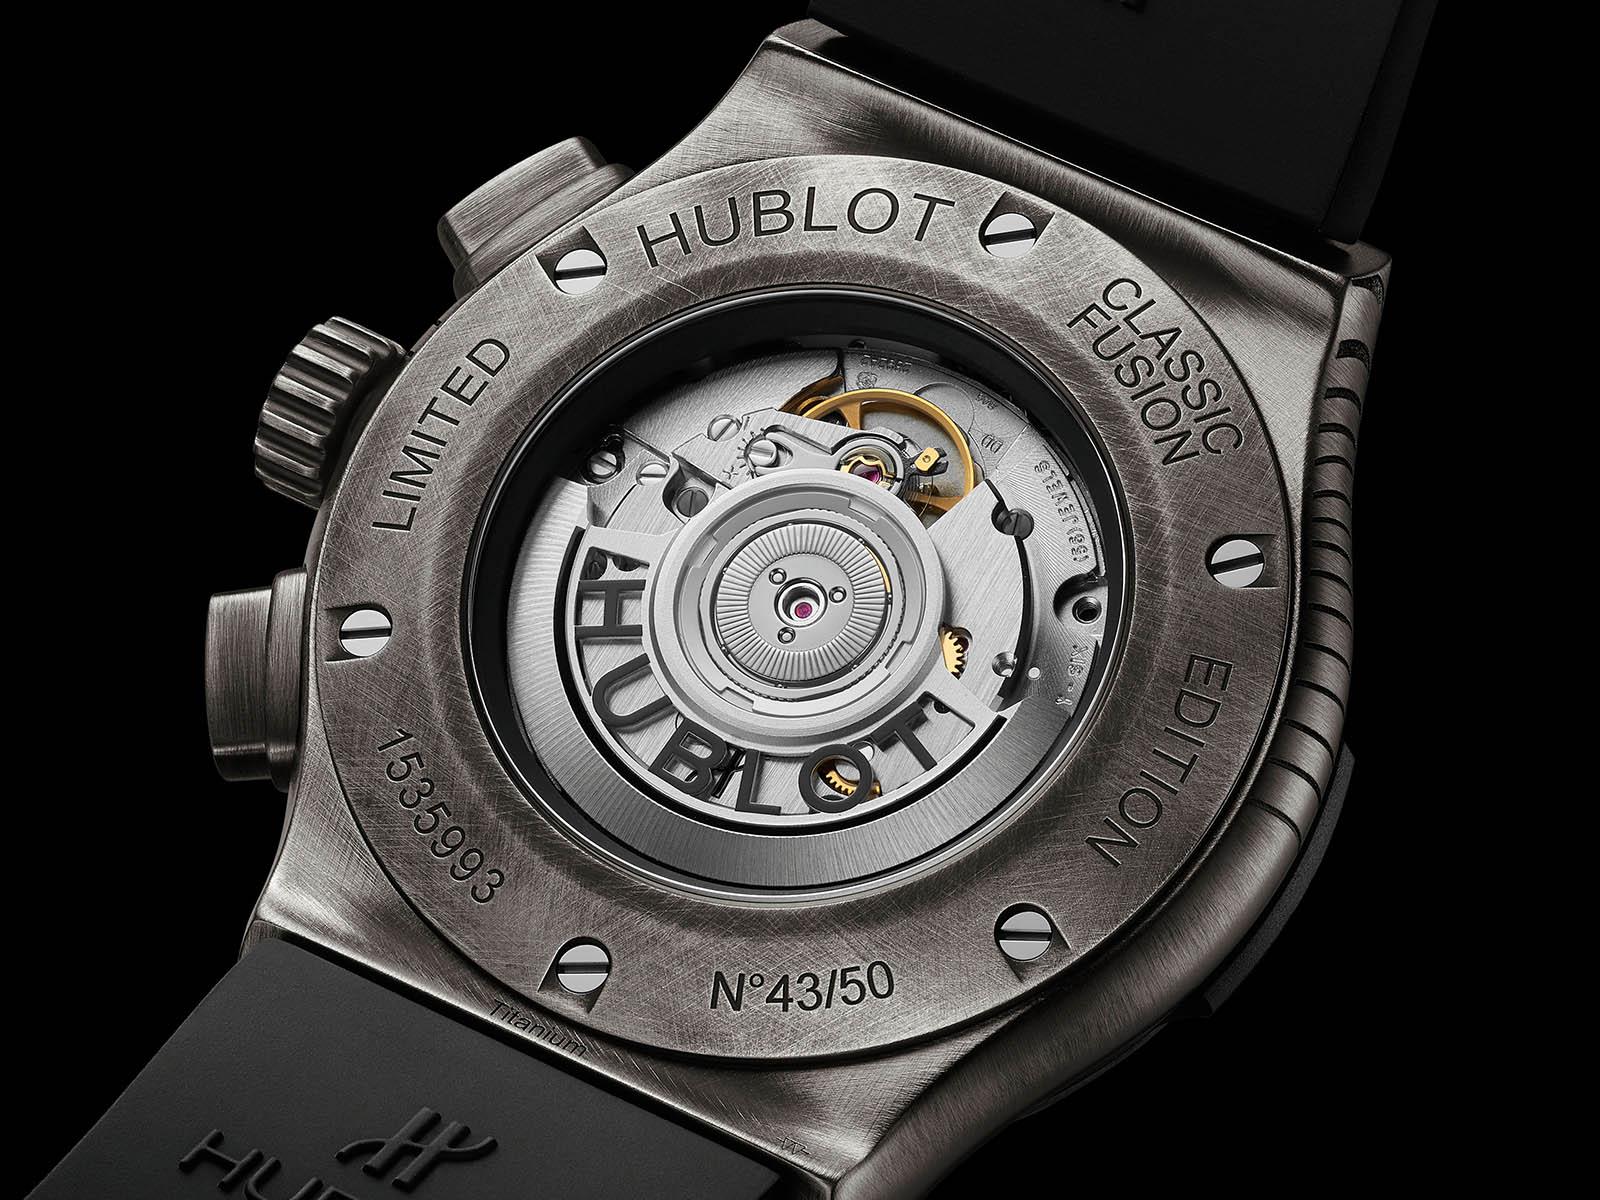 525-nx-0137-rx-shf21-hublot-classic-fusion-chronograph-shepard-fairey-9.jpg